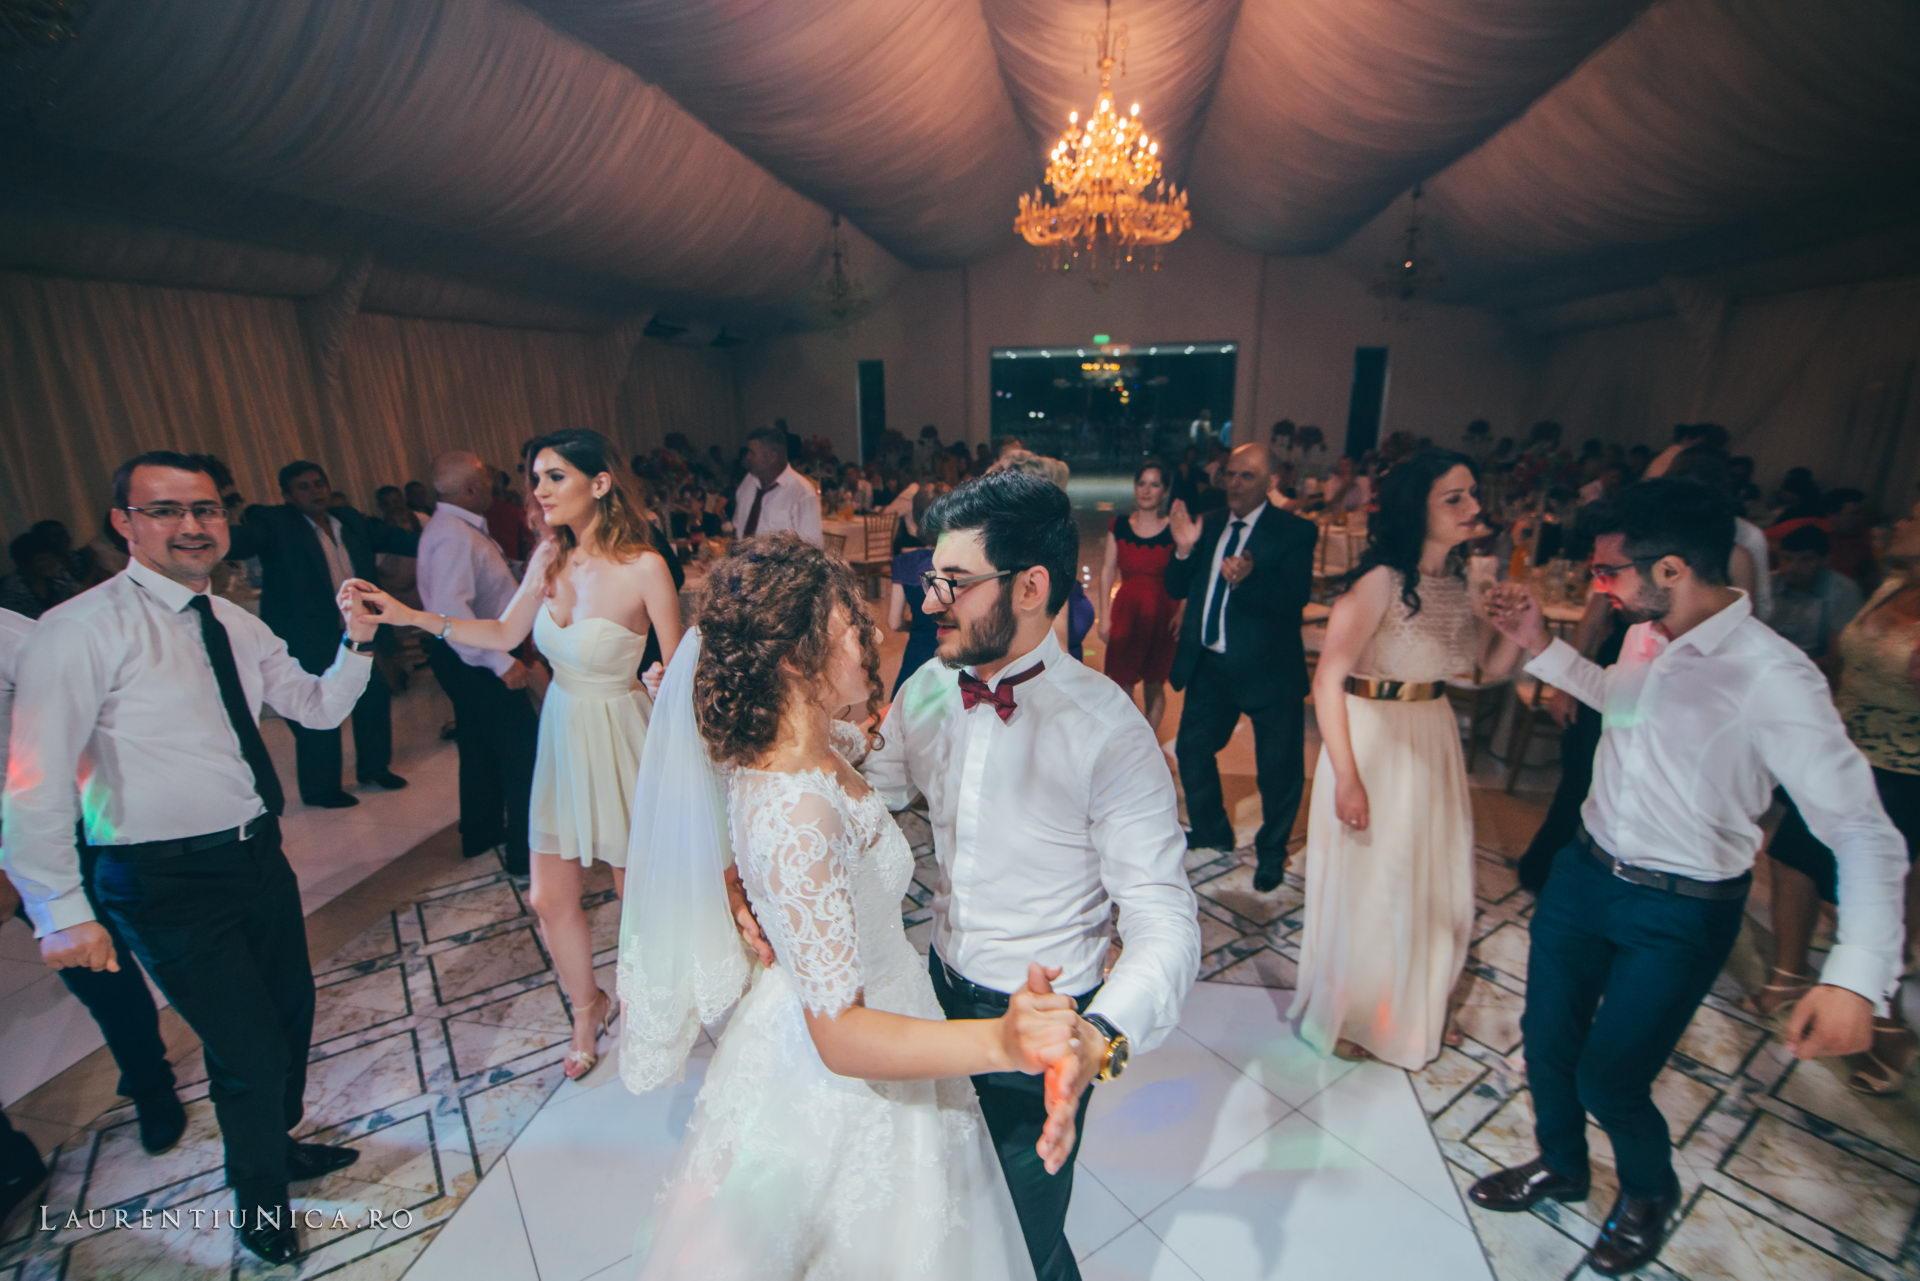 , Alina & Danut | Fotografii nunta | Craiova